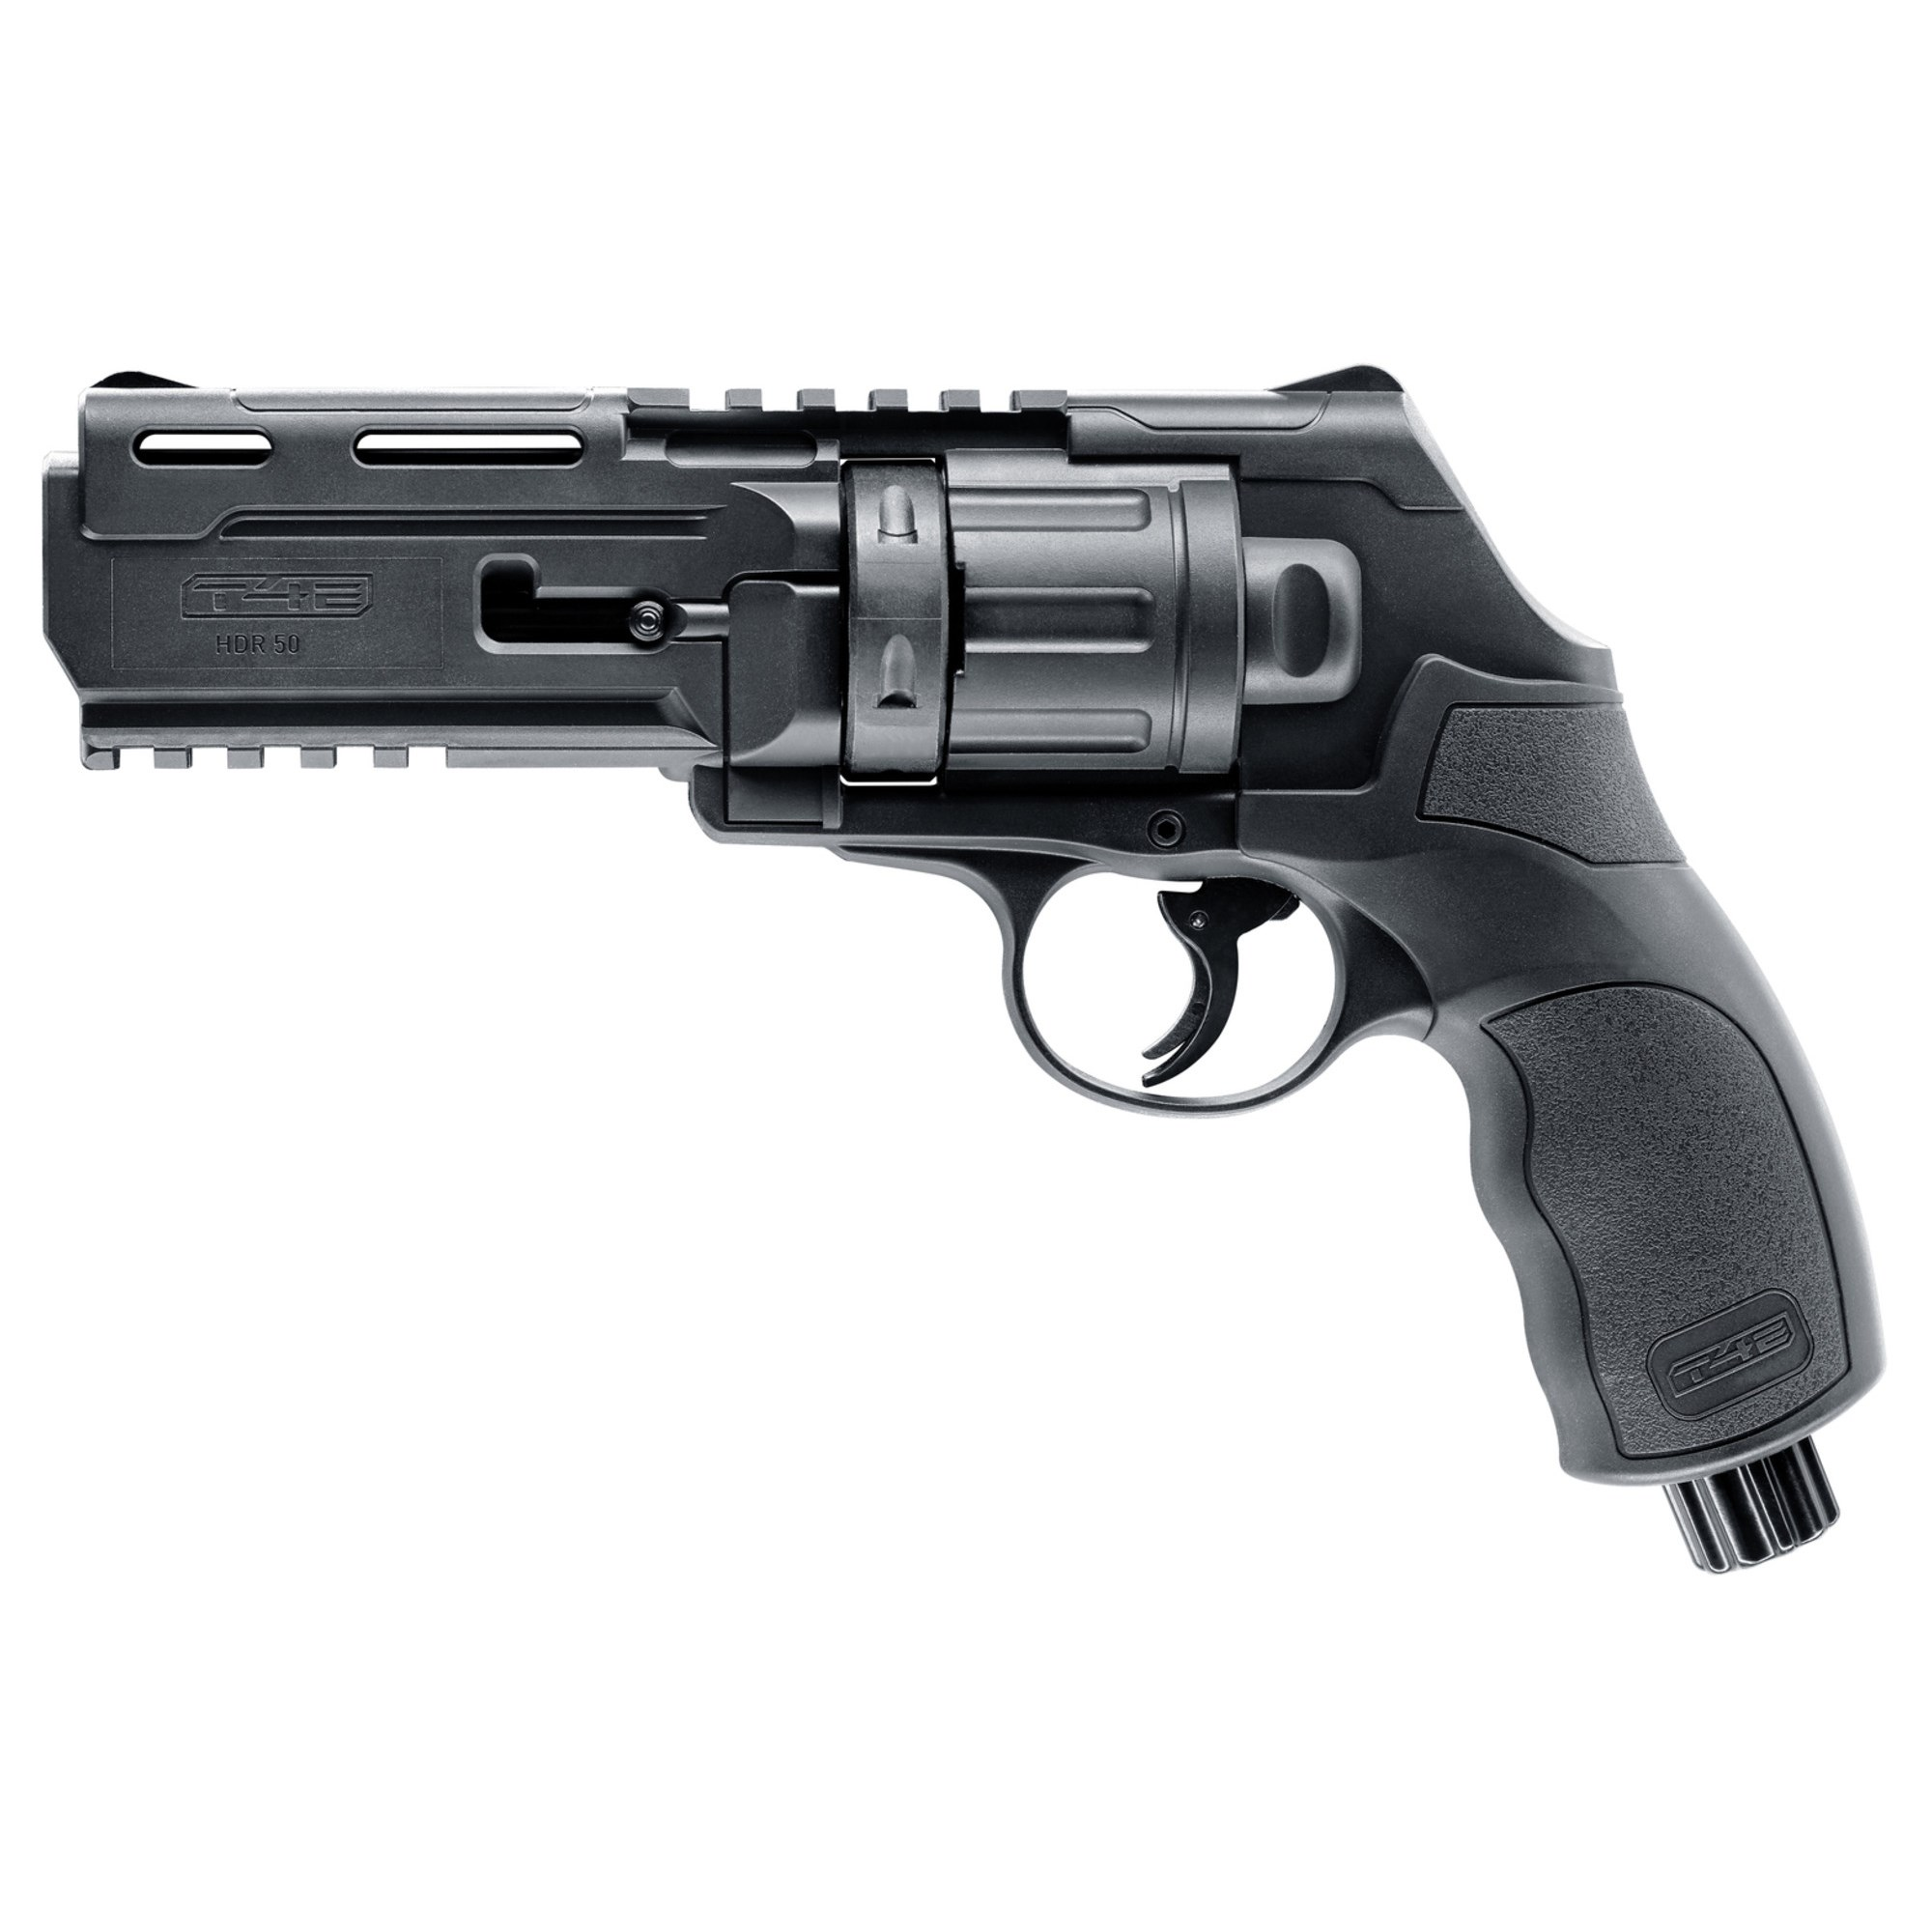 Revolver vzduchový Umarex T4E HDR 50 11J - zvìtšit obrázek